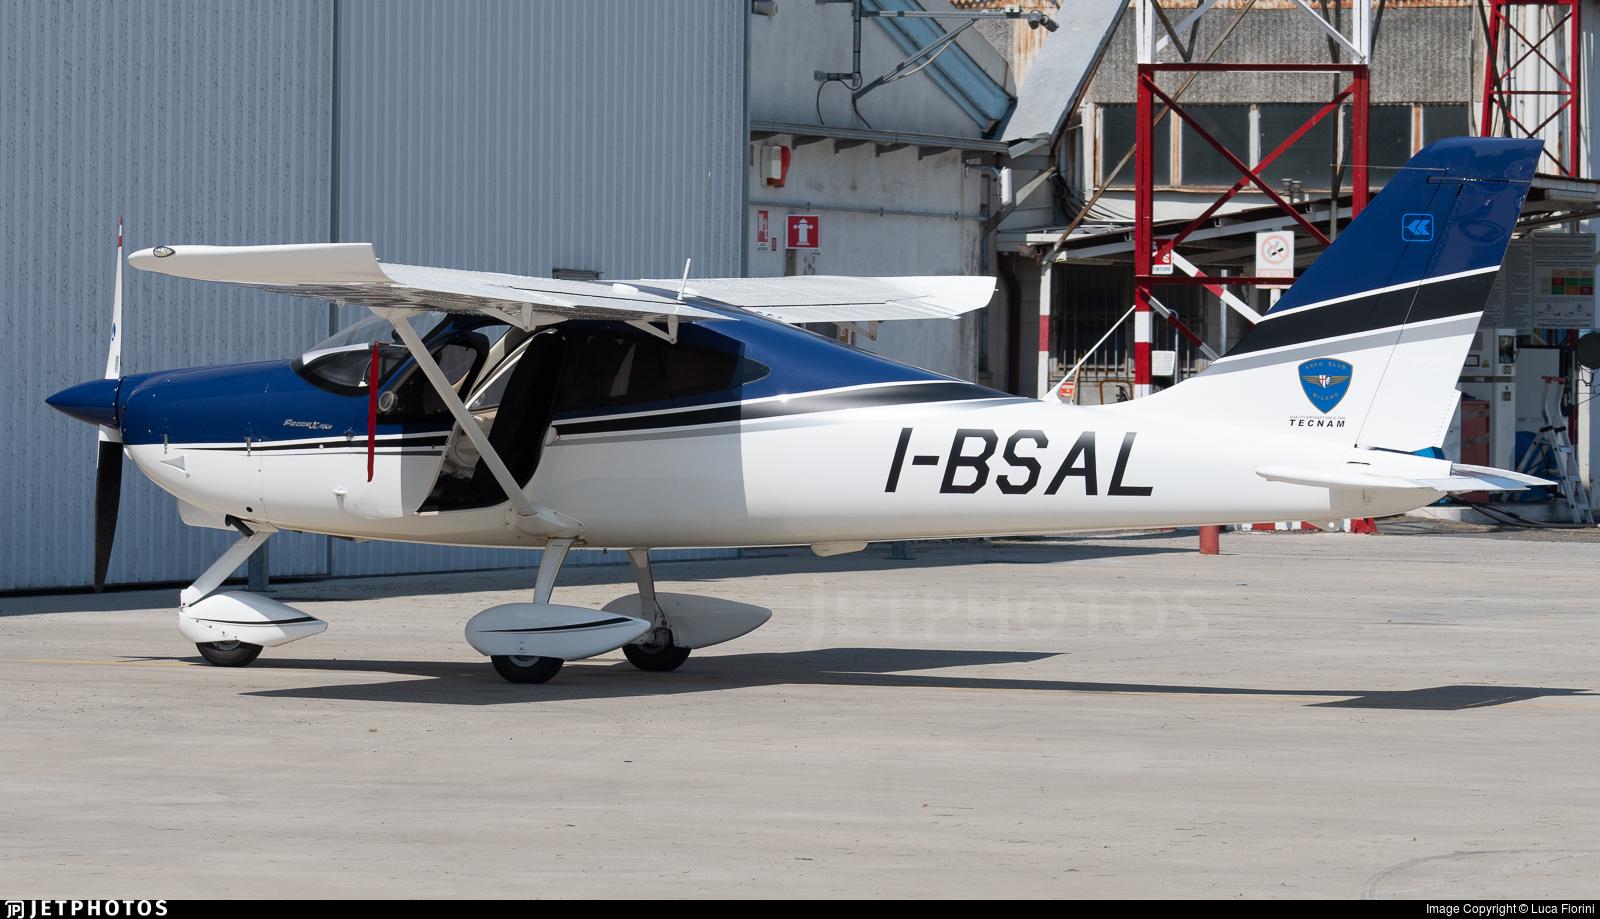 I-BSAL - Tecnam P2008-JC MKII - Aero Club - Milano